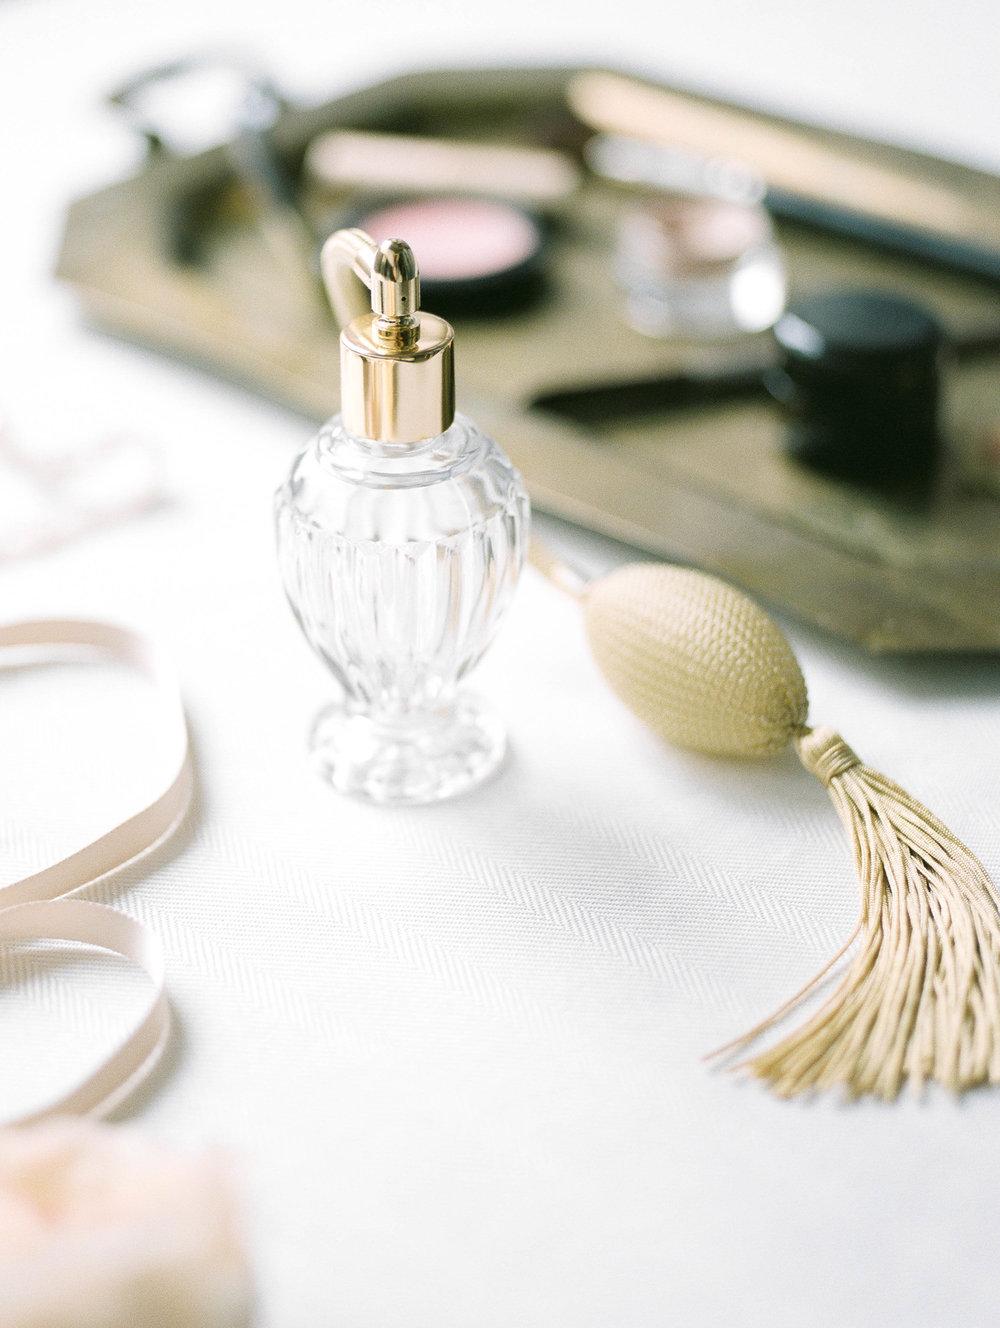 Perfume Atomizer - www.jleephotos.com